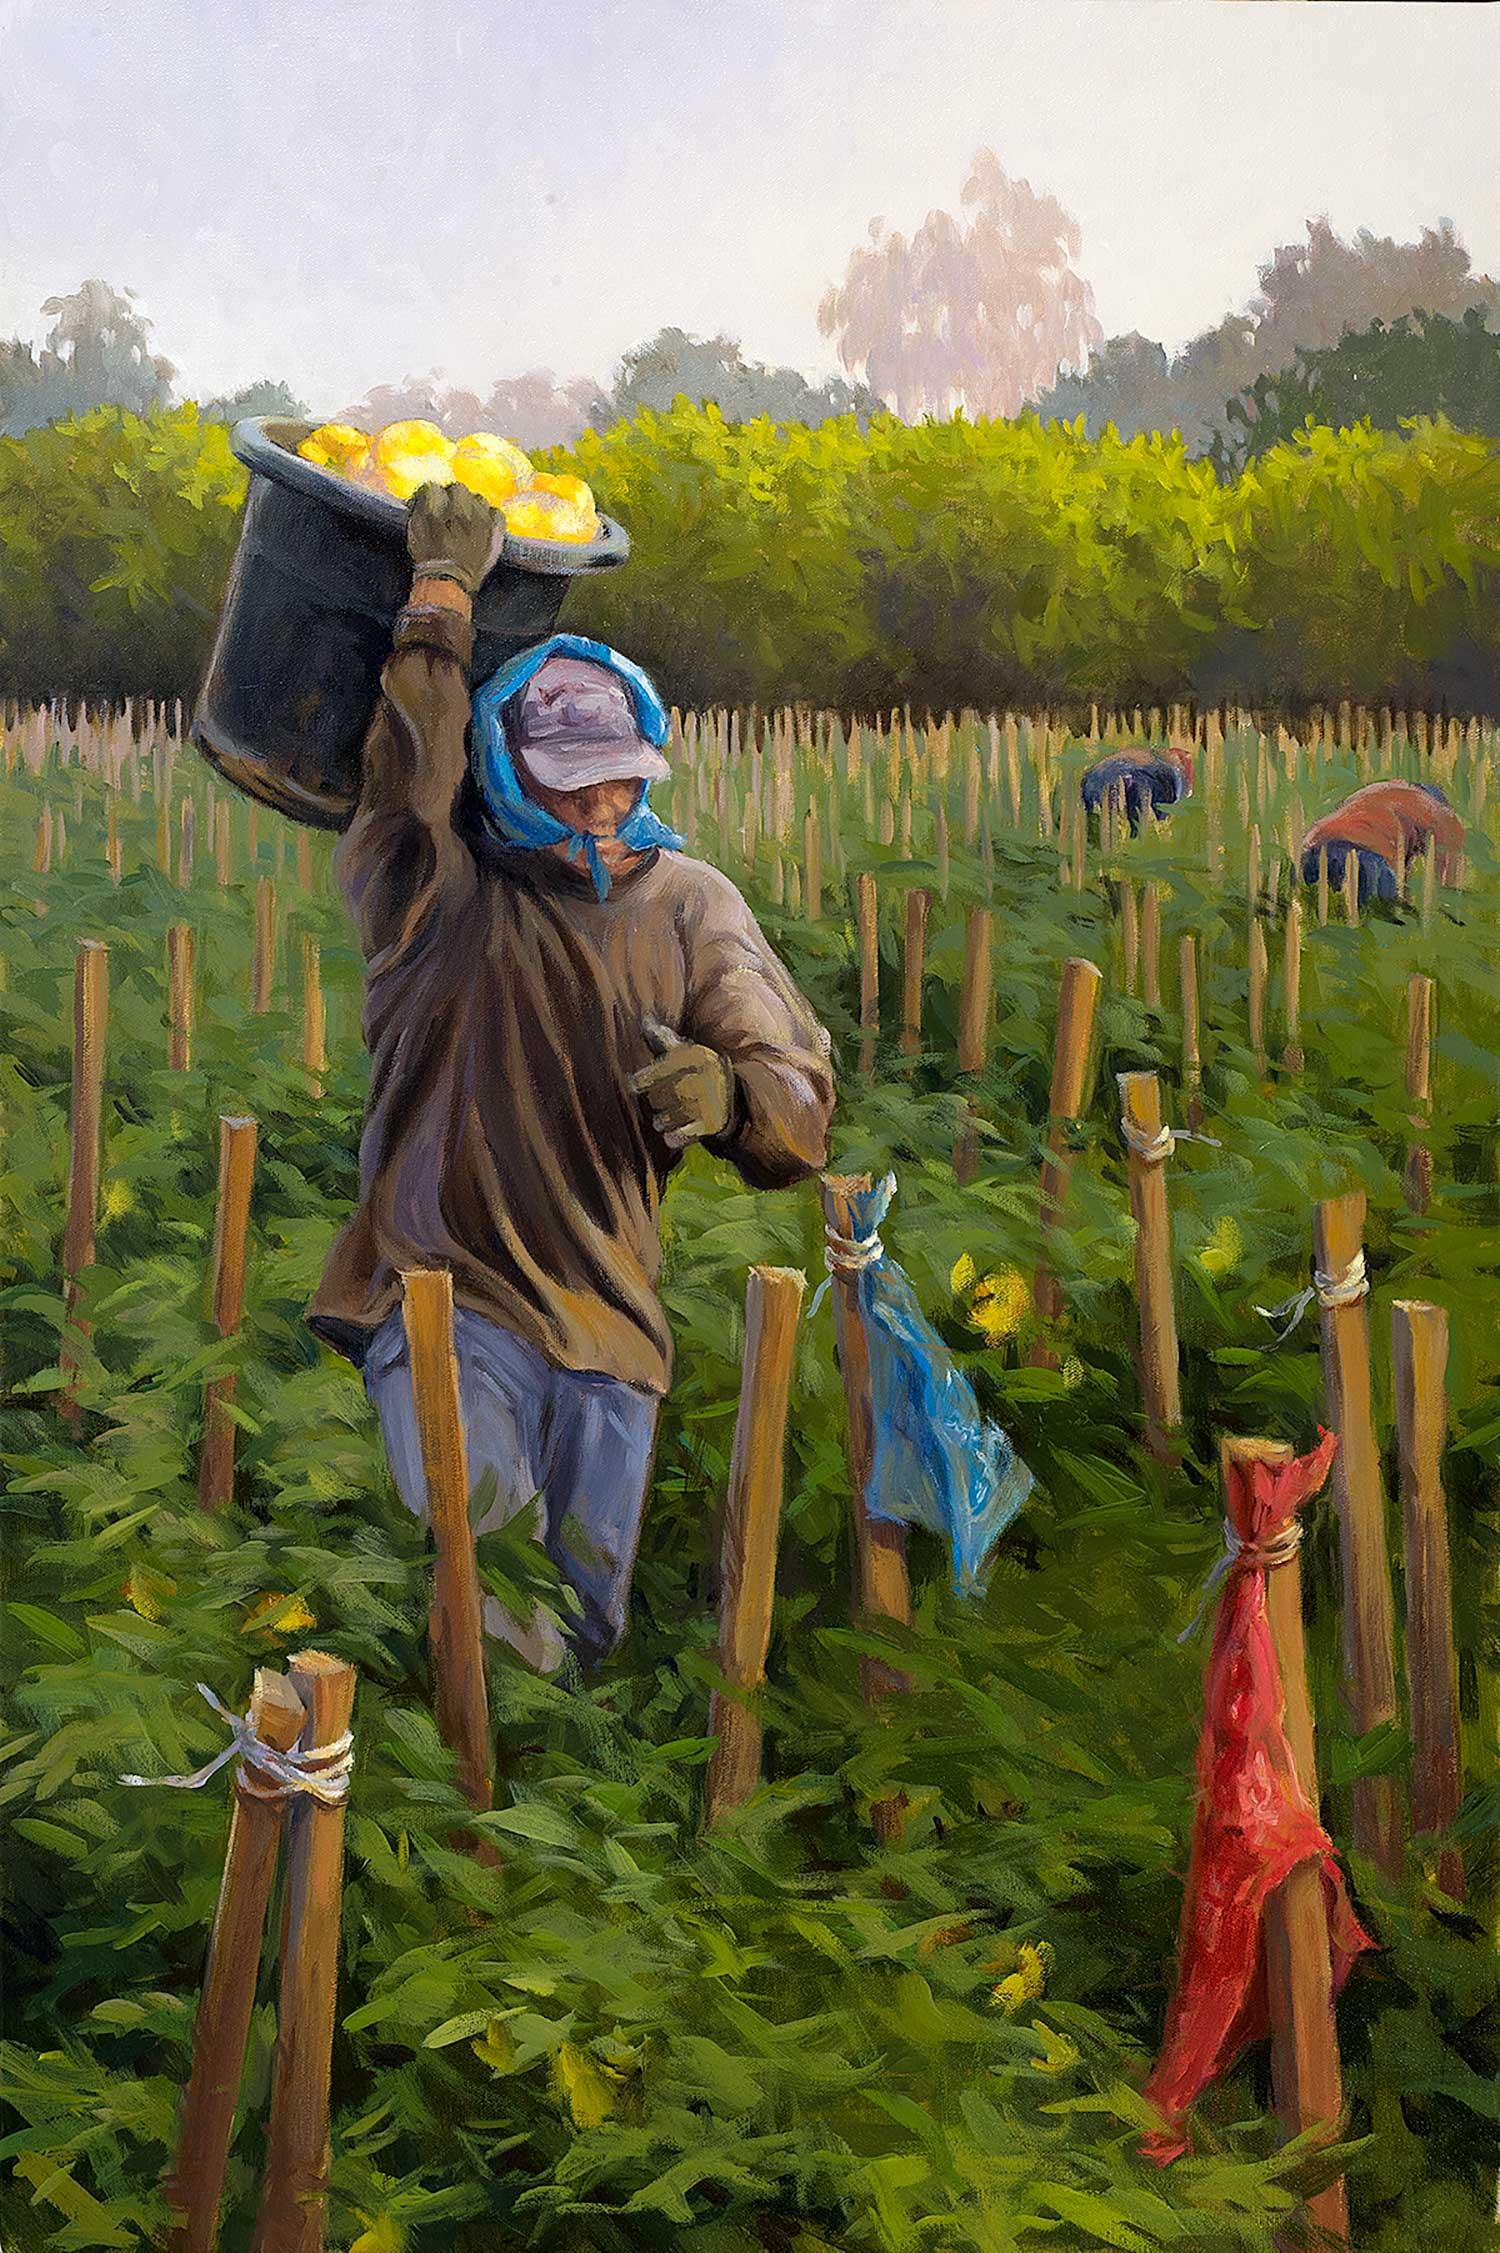 """Man in a Blue Bandana"" by Gail Pidduck"